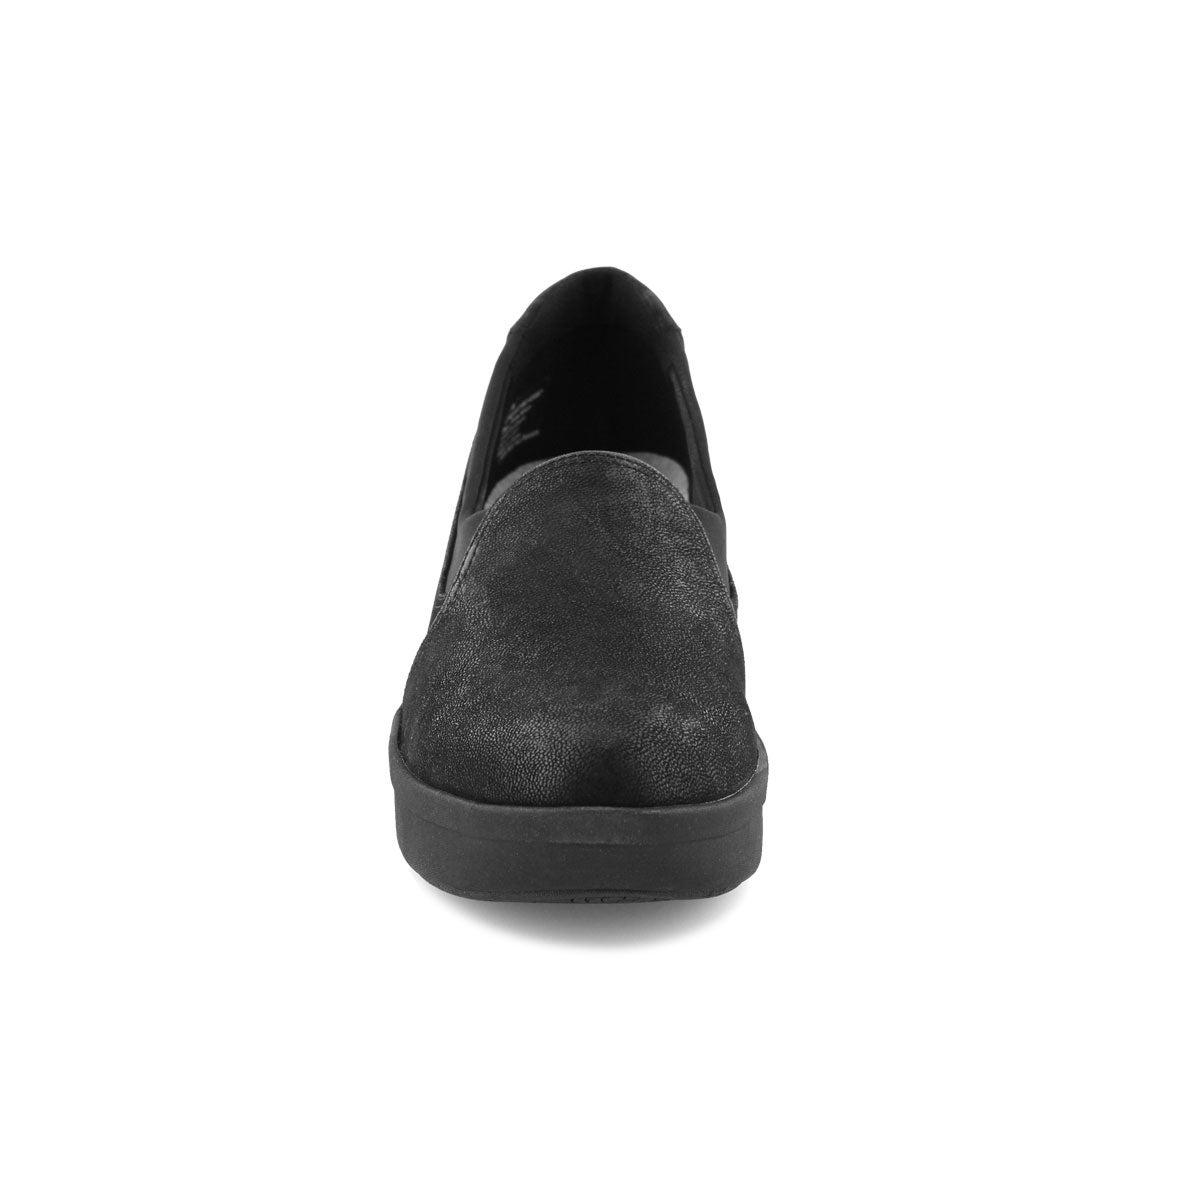 Lds Step Rose Moon black slip on shoe